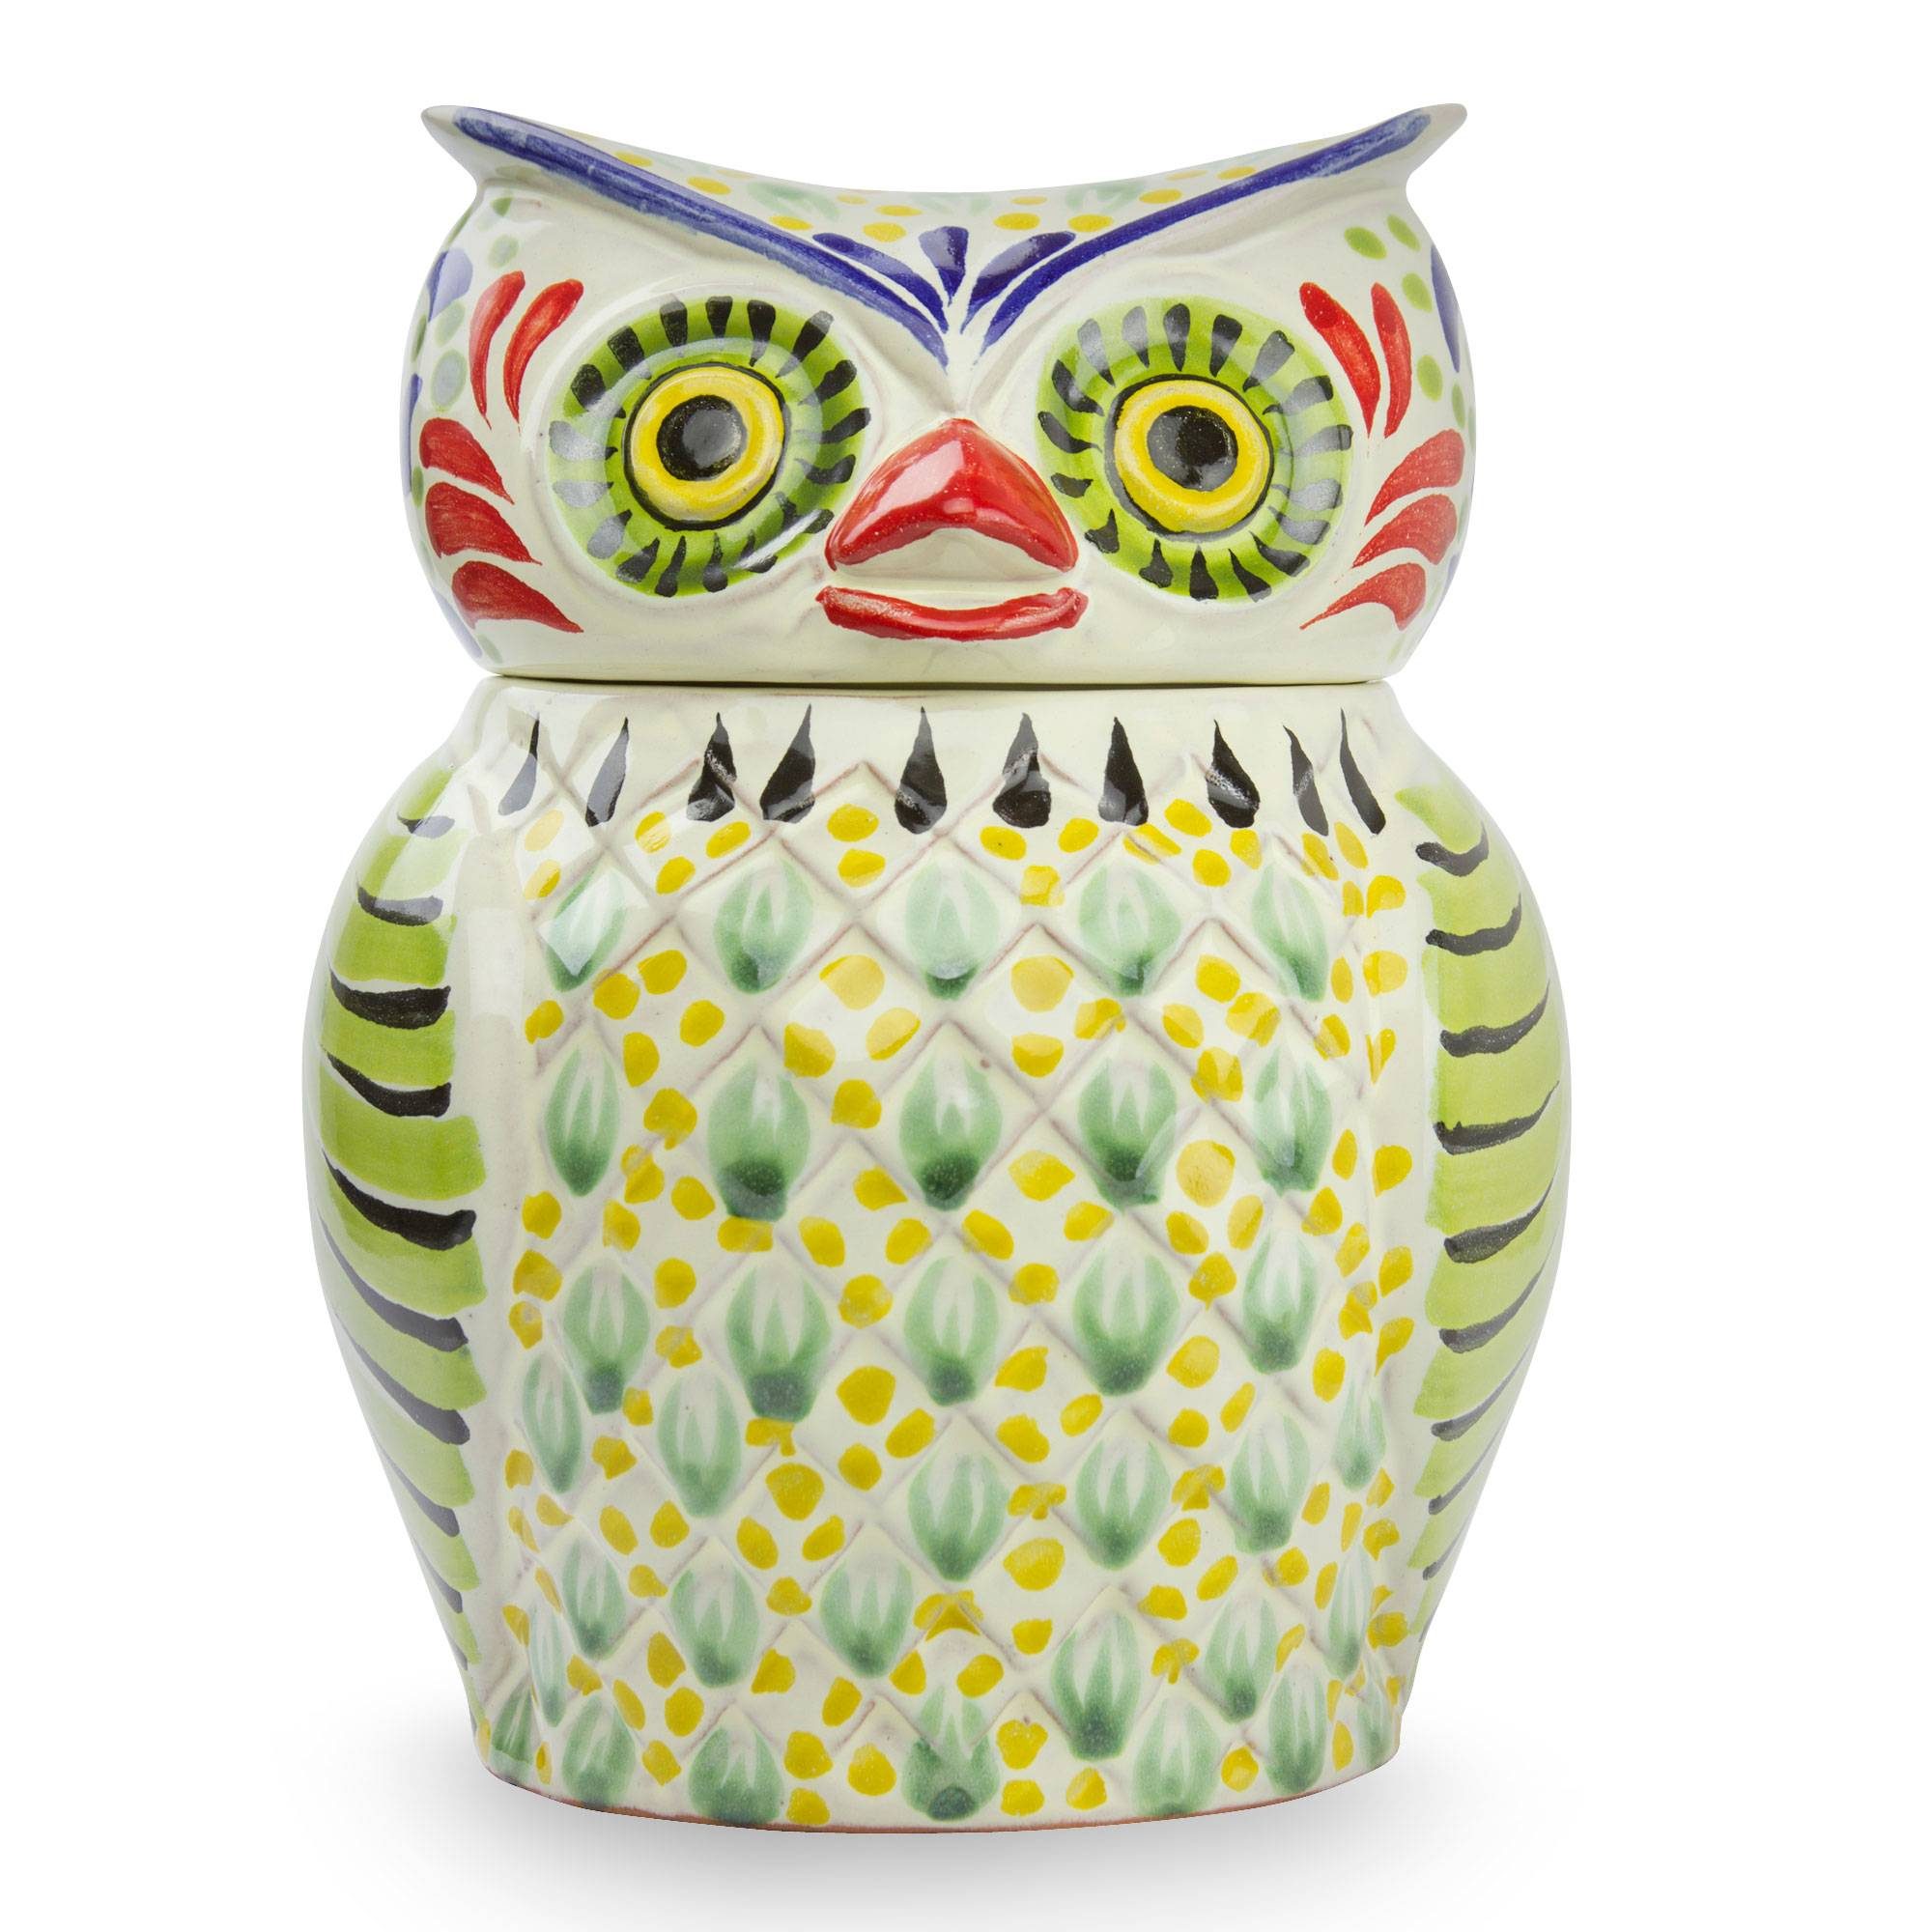 Artisan Crafted Majolica Ceramic Bird Cookie Jar - Owl Treats | NOVICA